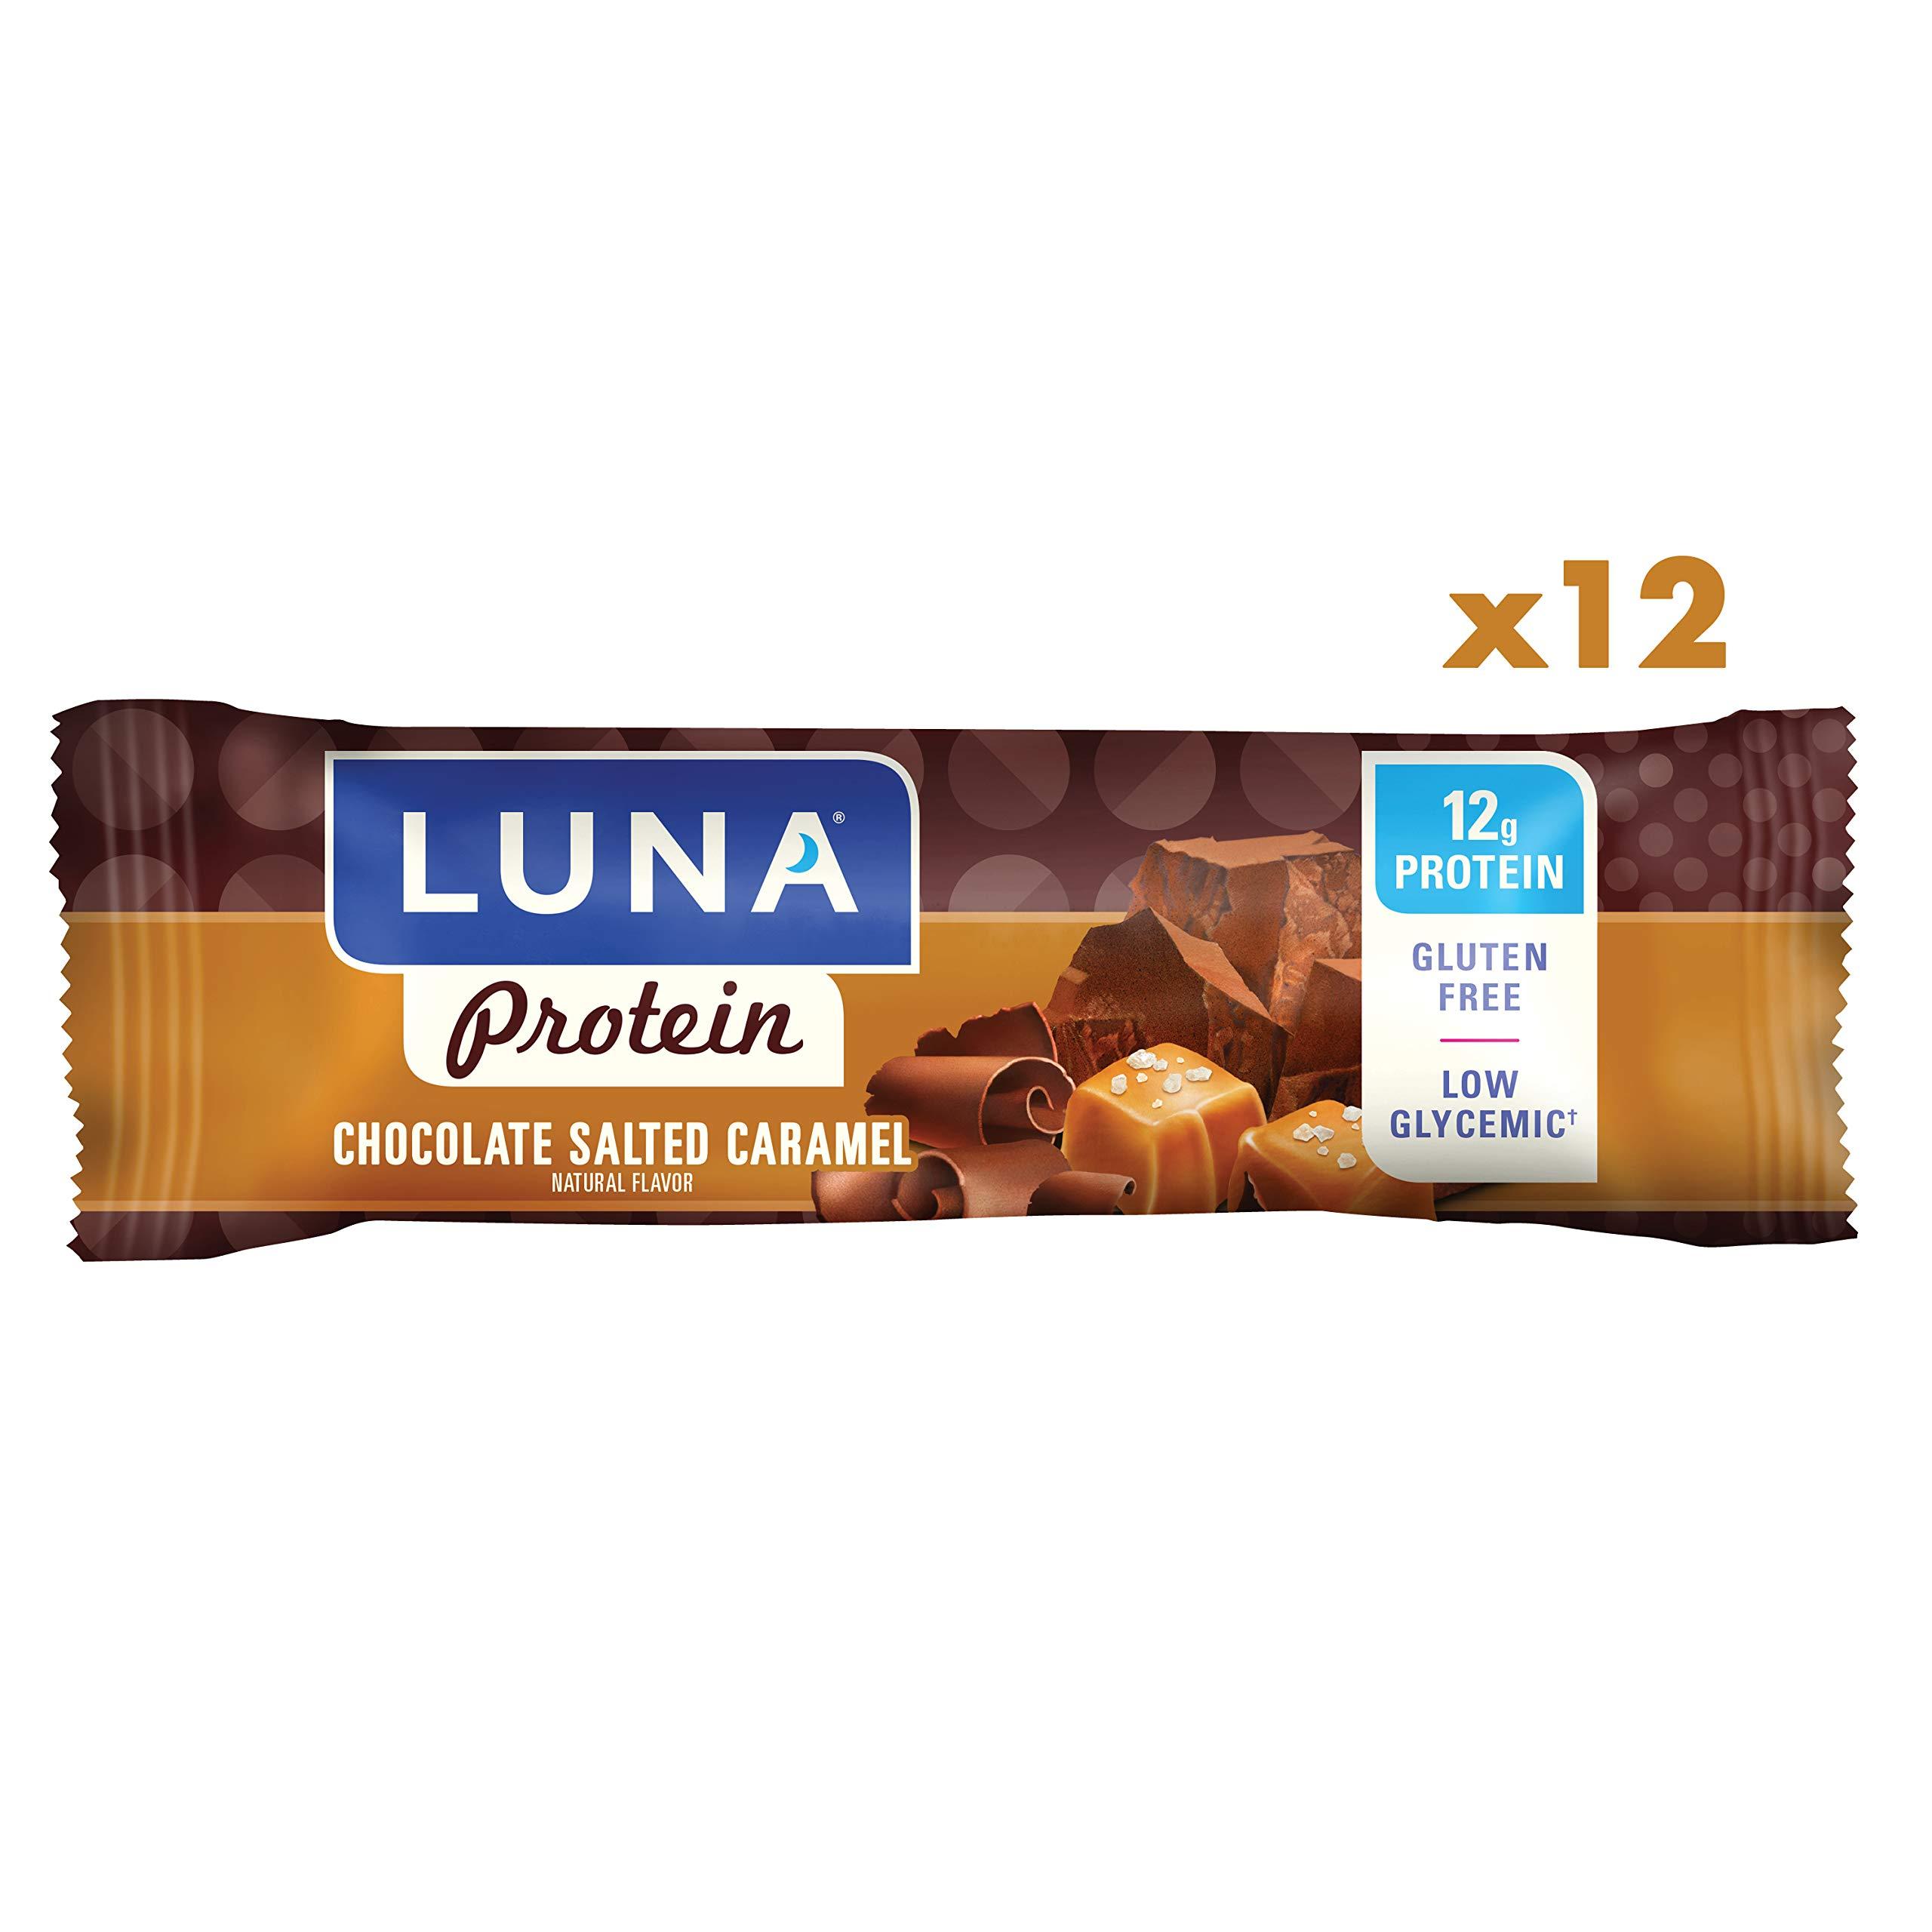 2ad776b1d0c LUNA PROTEIN - Gluten Free Protein Bar - Chocolate Salted Caramel Flavor -  (1.59 Ounce